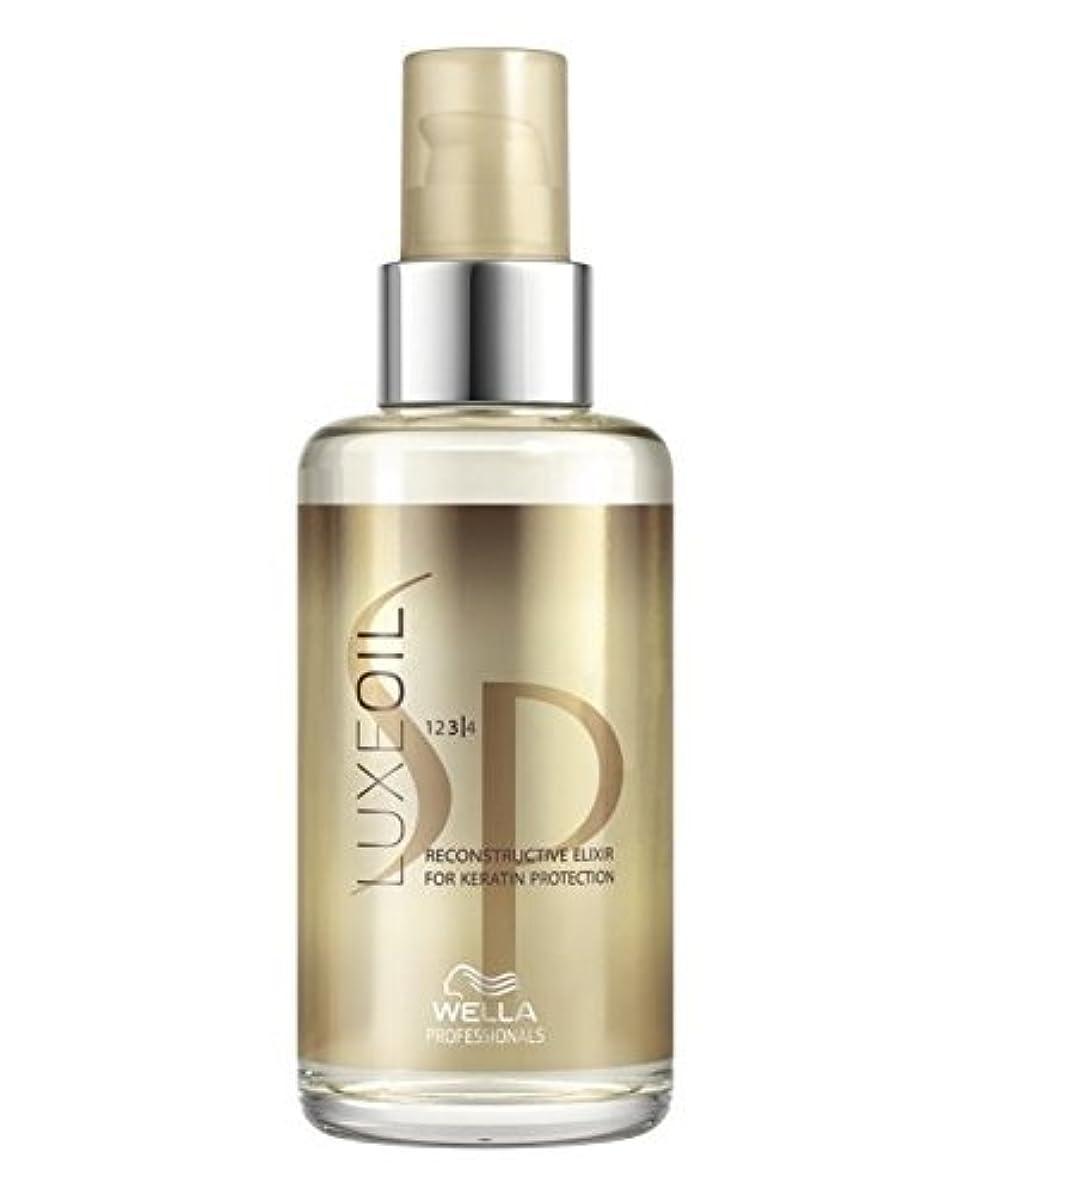 除去モス発掘SP by Wella Luxe Hair Oil Reconstructive Elixir 100ml by Wella [並行輸入品]